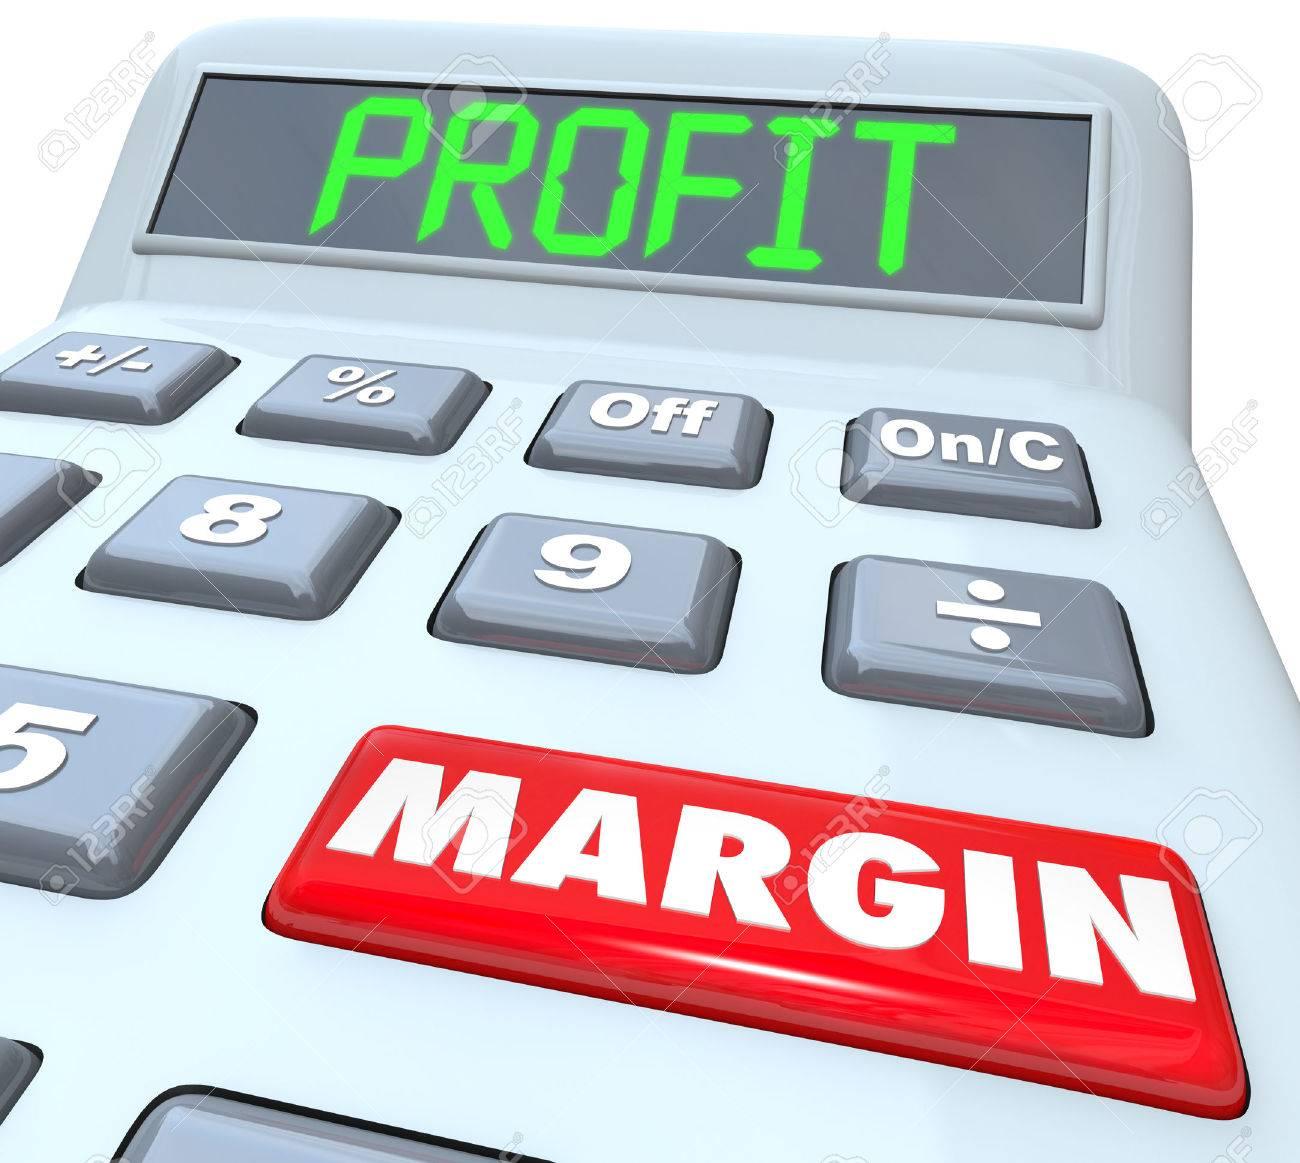 Profit Margin Words On A Plastic Calculator To Illustrate Adding ...